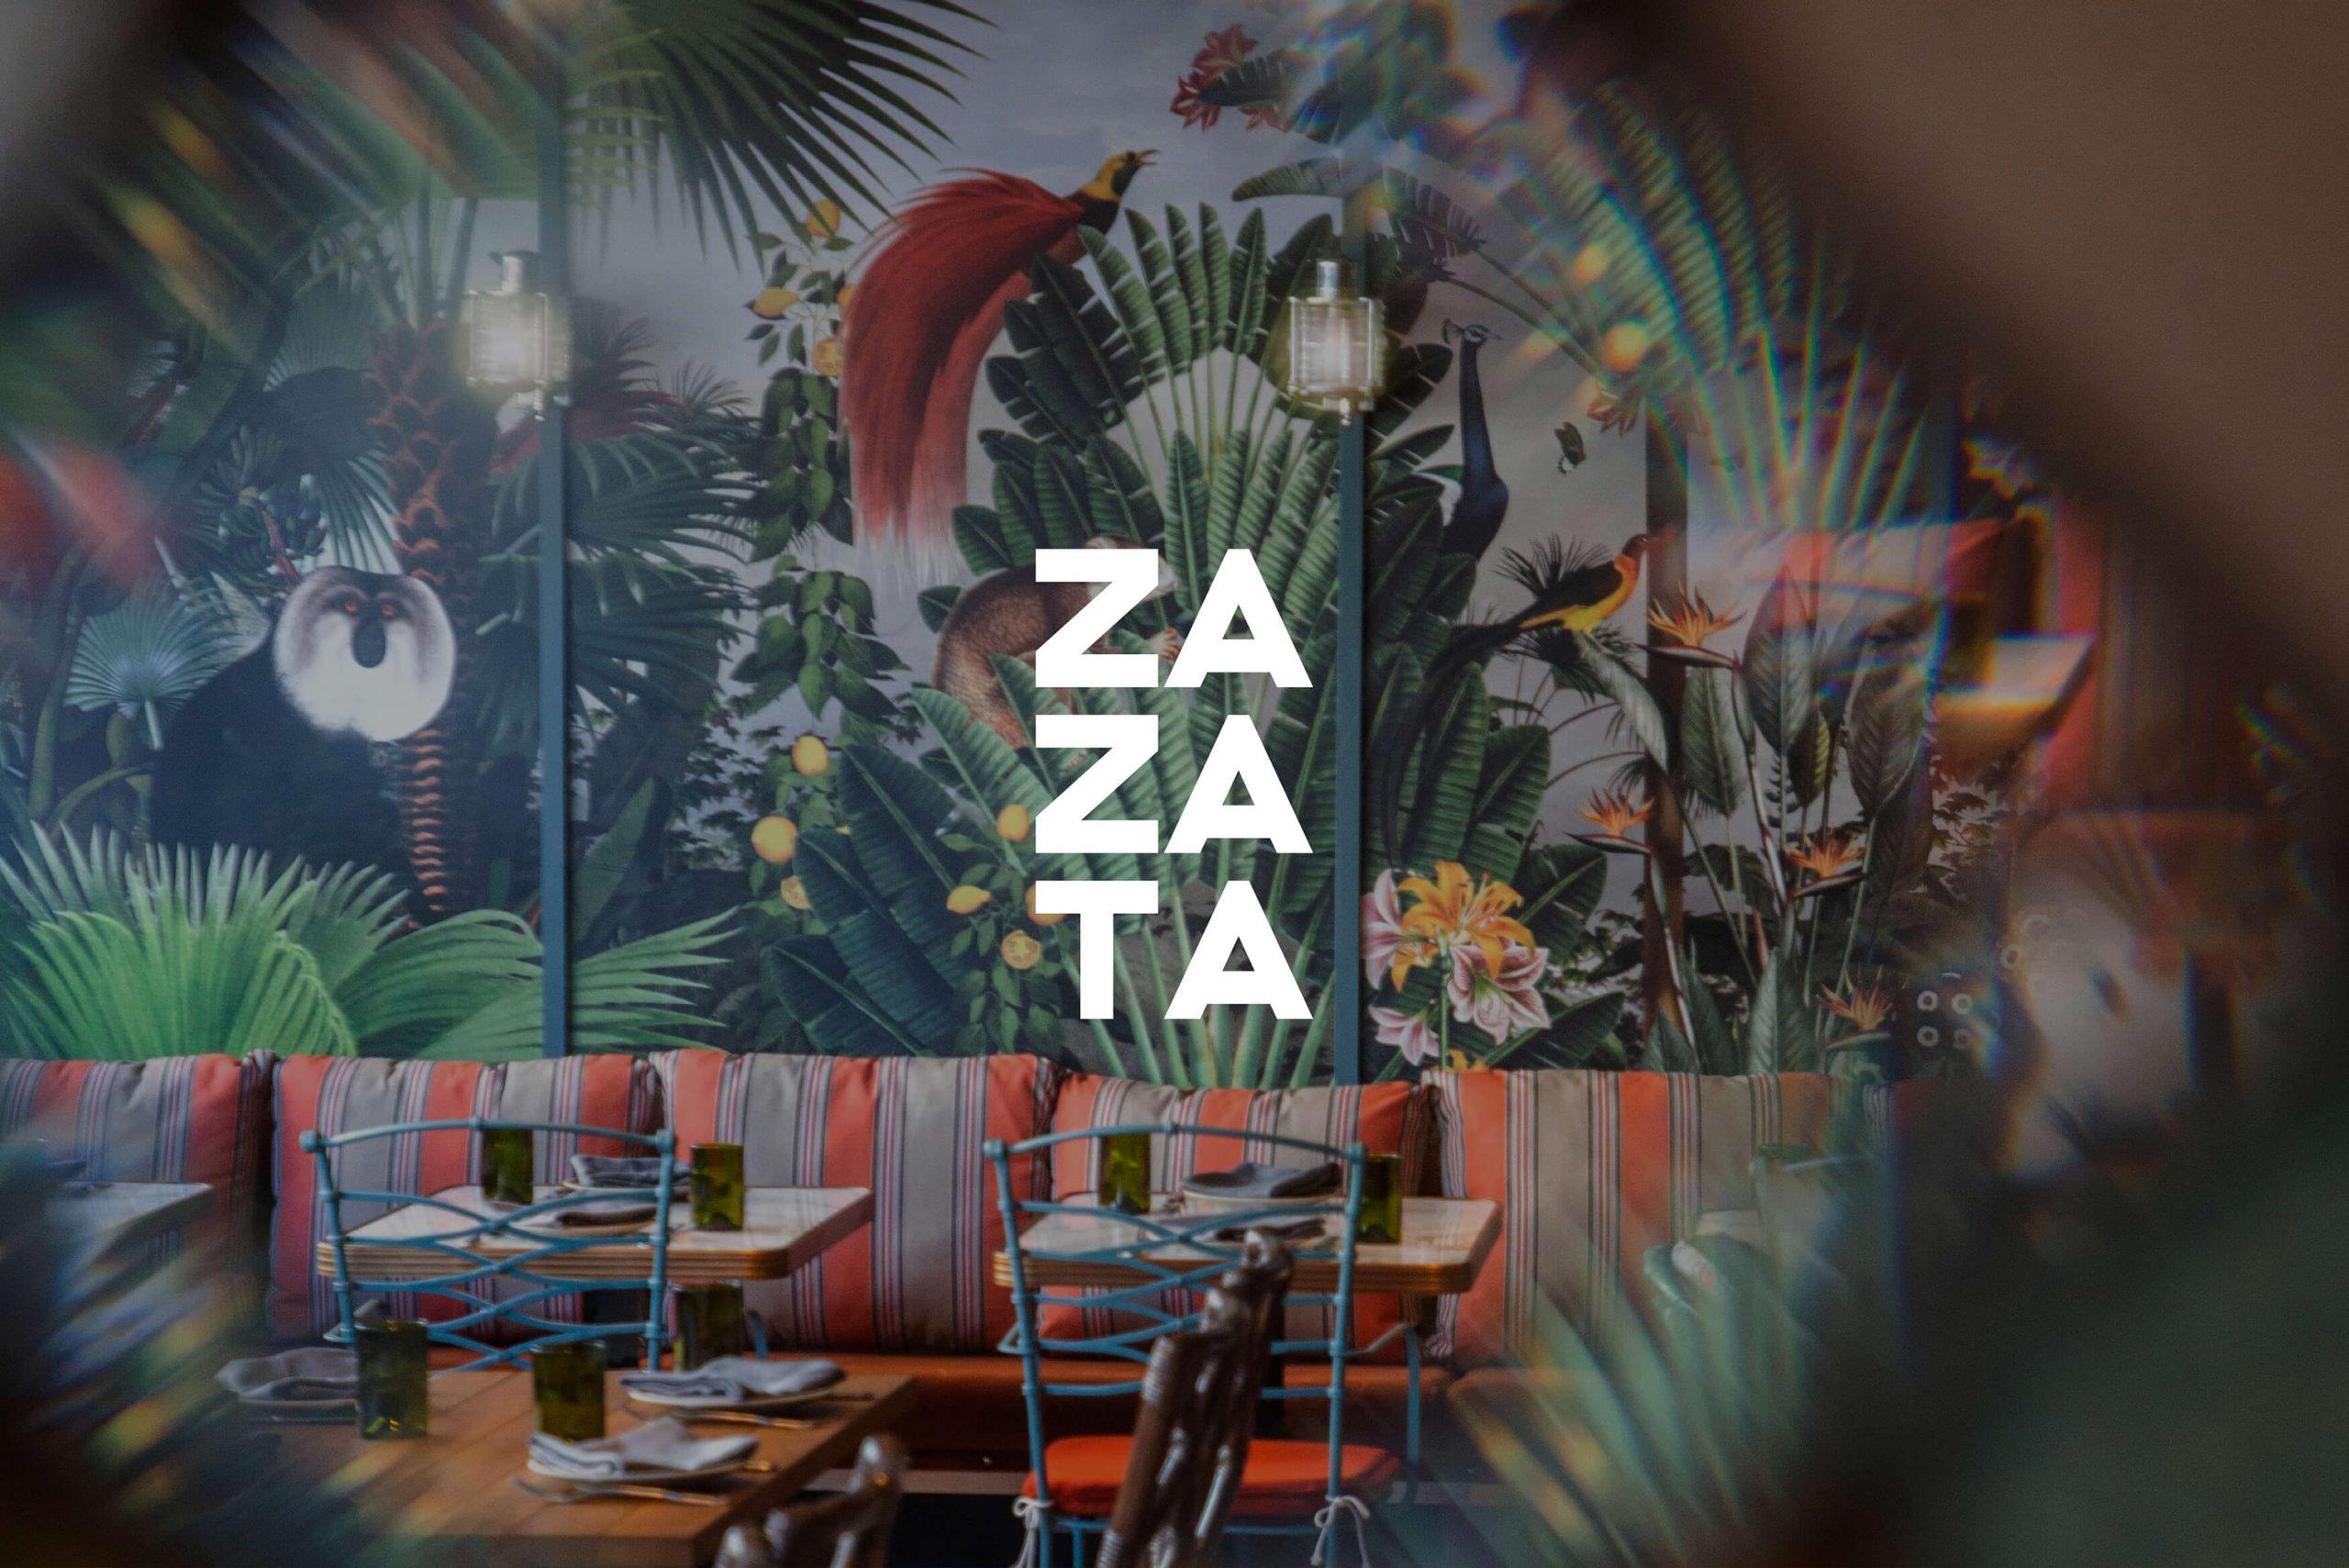 Ovolo Za Za Ta Hospitality Visual Identity - logotype on photographic background